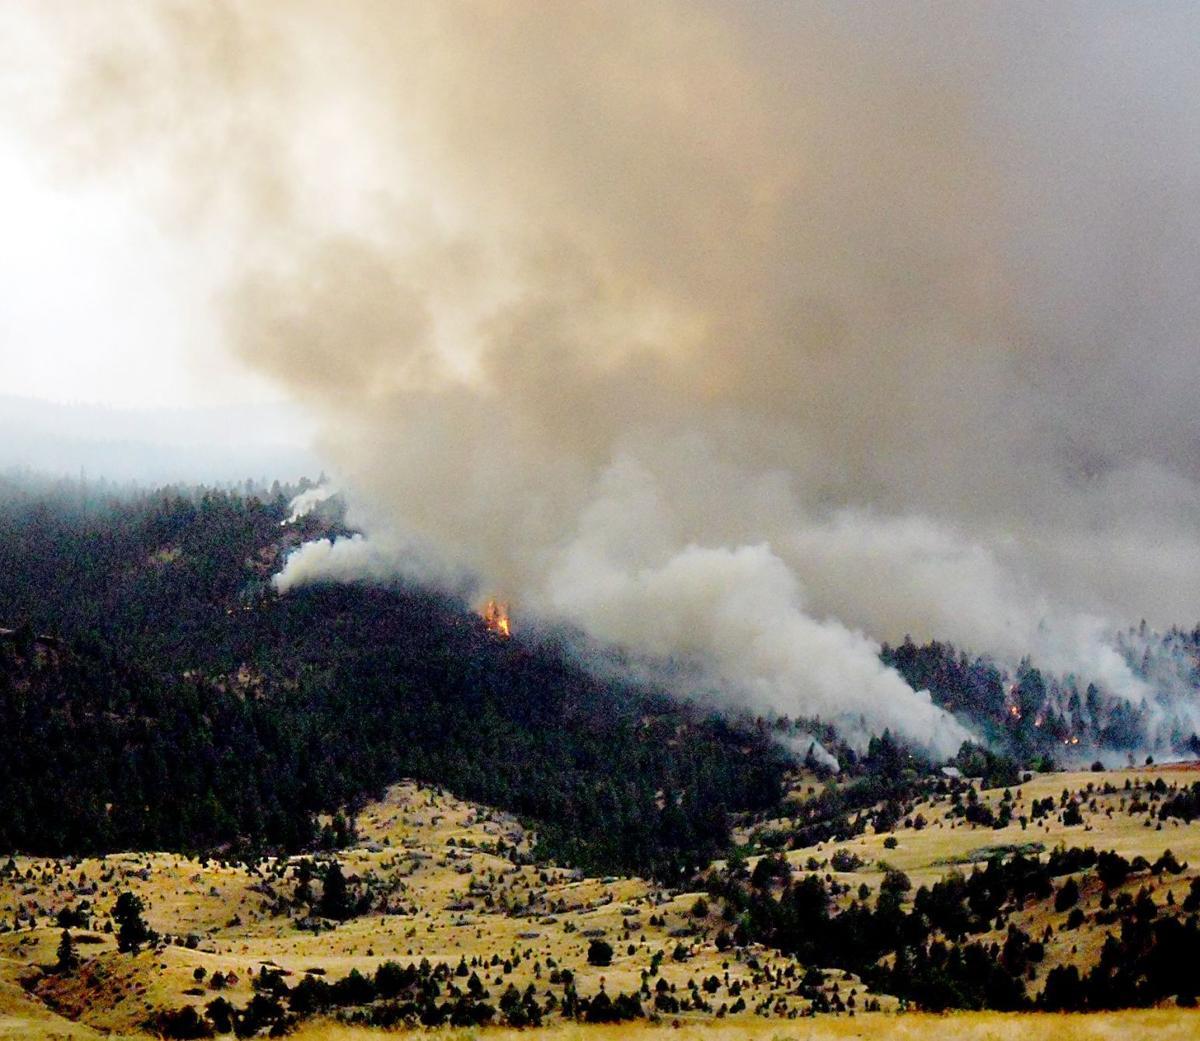 Crews battle Lost Hubcap Fire